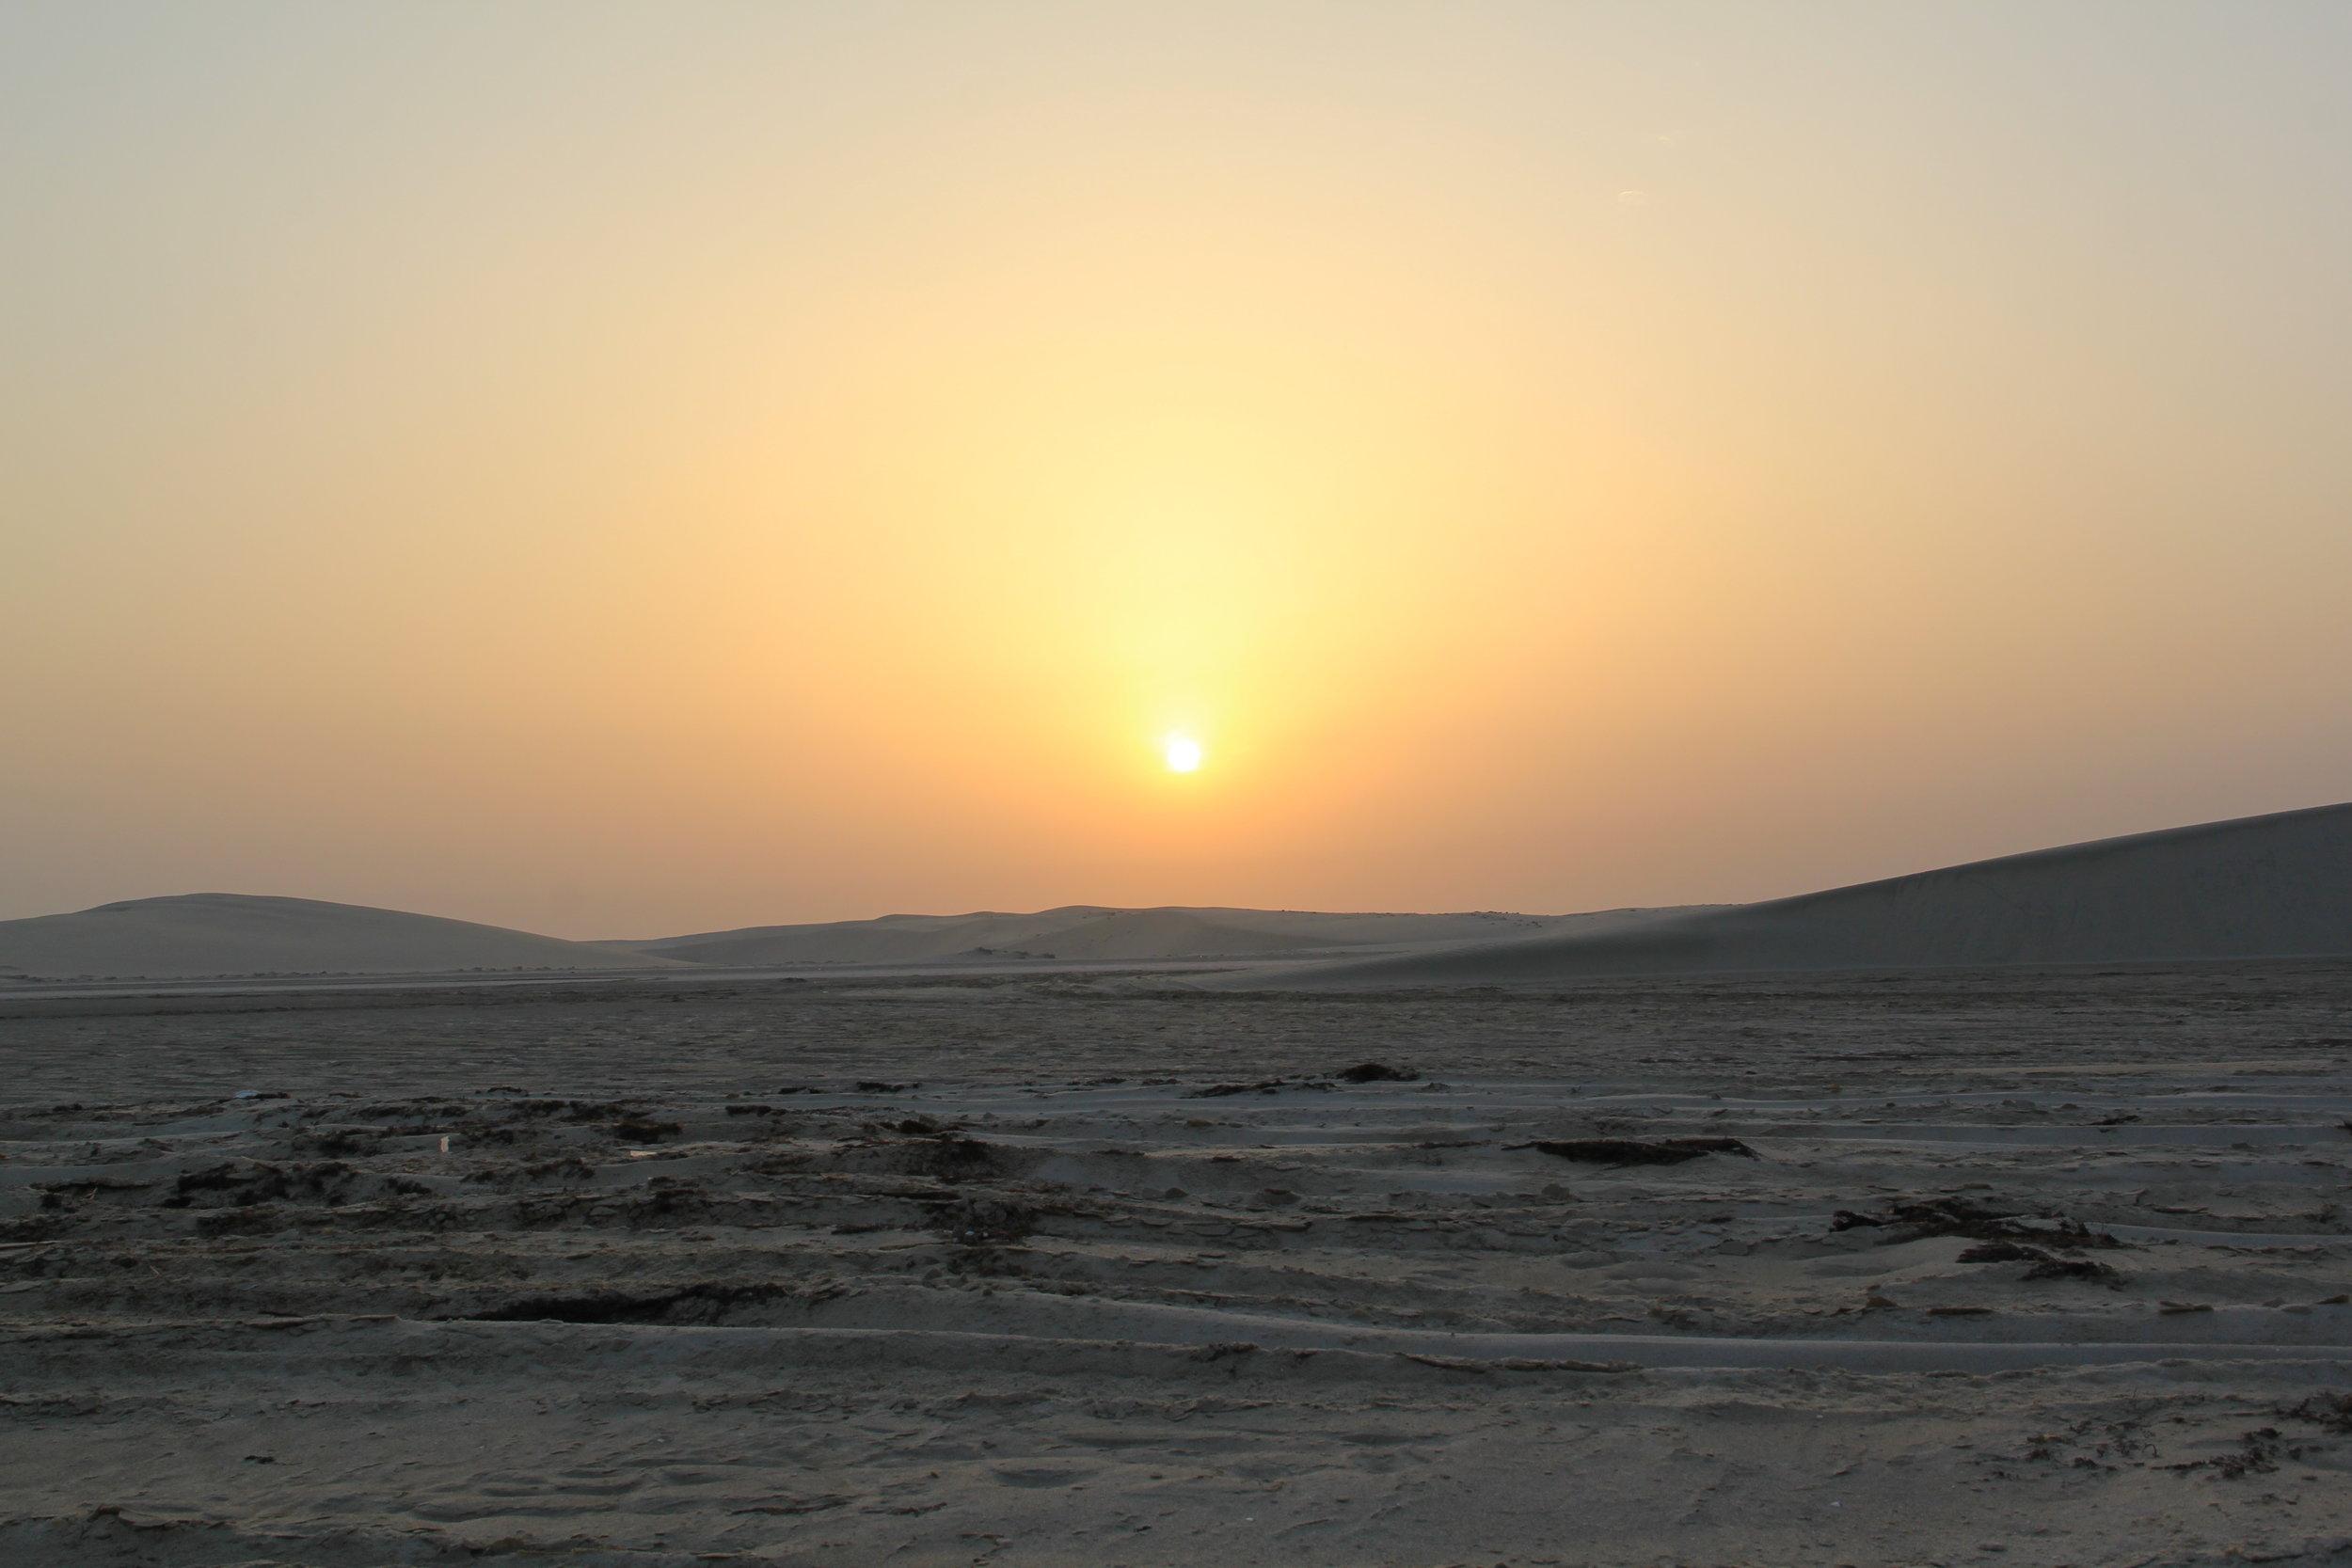 The Desert at Sunset. Mesaieed Sand Dunes, Mesaieed, Qatar. Taken by: Tyanna LC